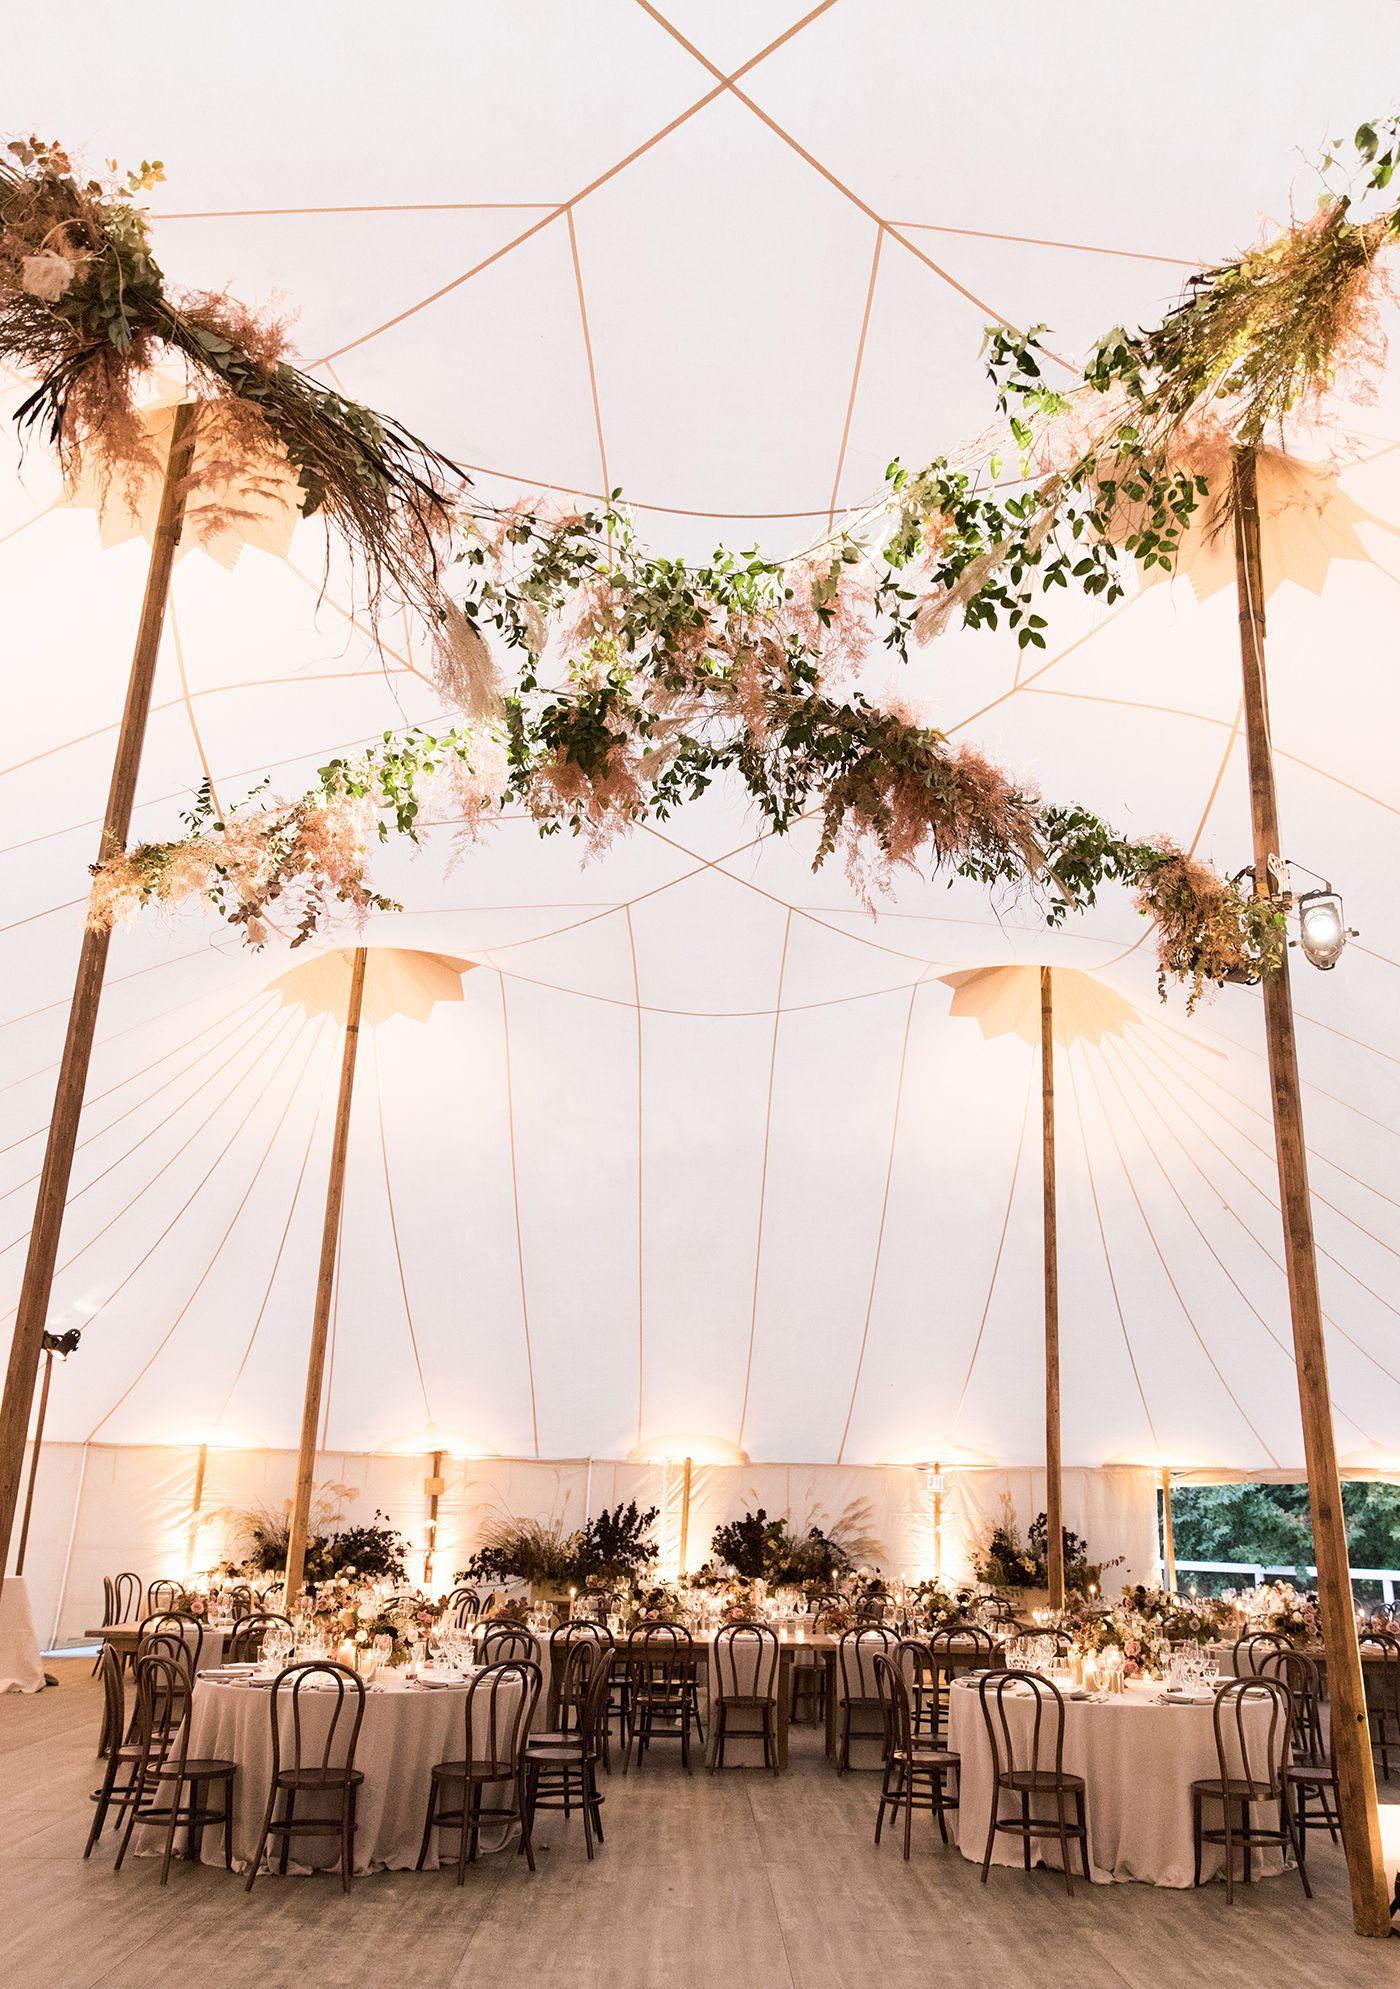 15 Magical Tent Decor Ideas For An Outdoor Wedding Green Wedding Shoes Outdoor Tent Wedding Tent Decorations Wedding Tent